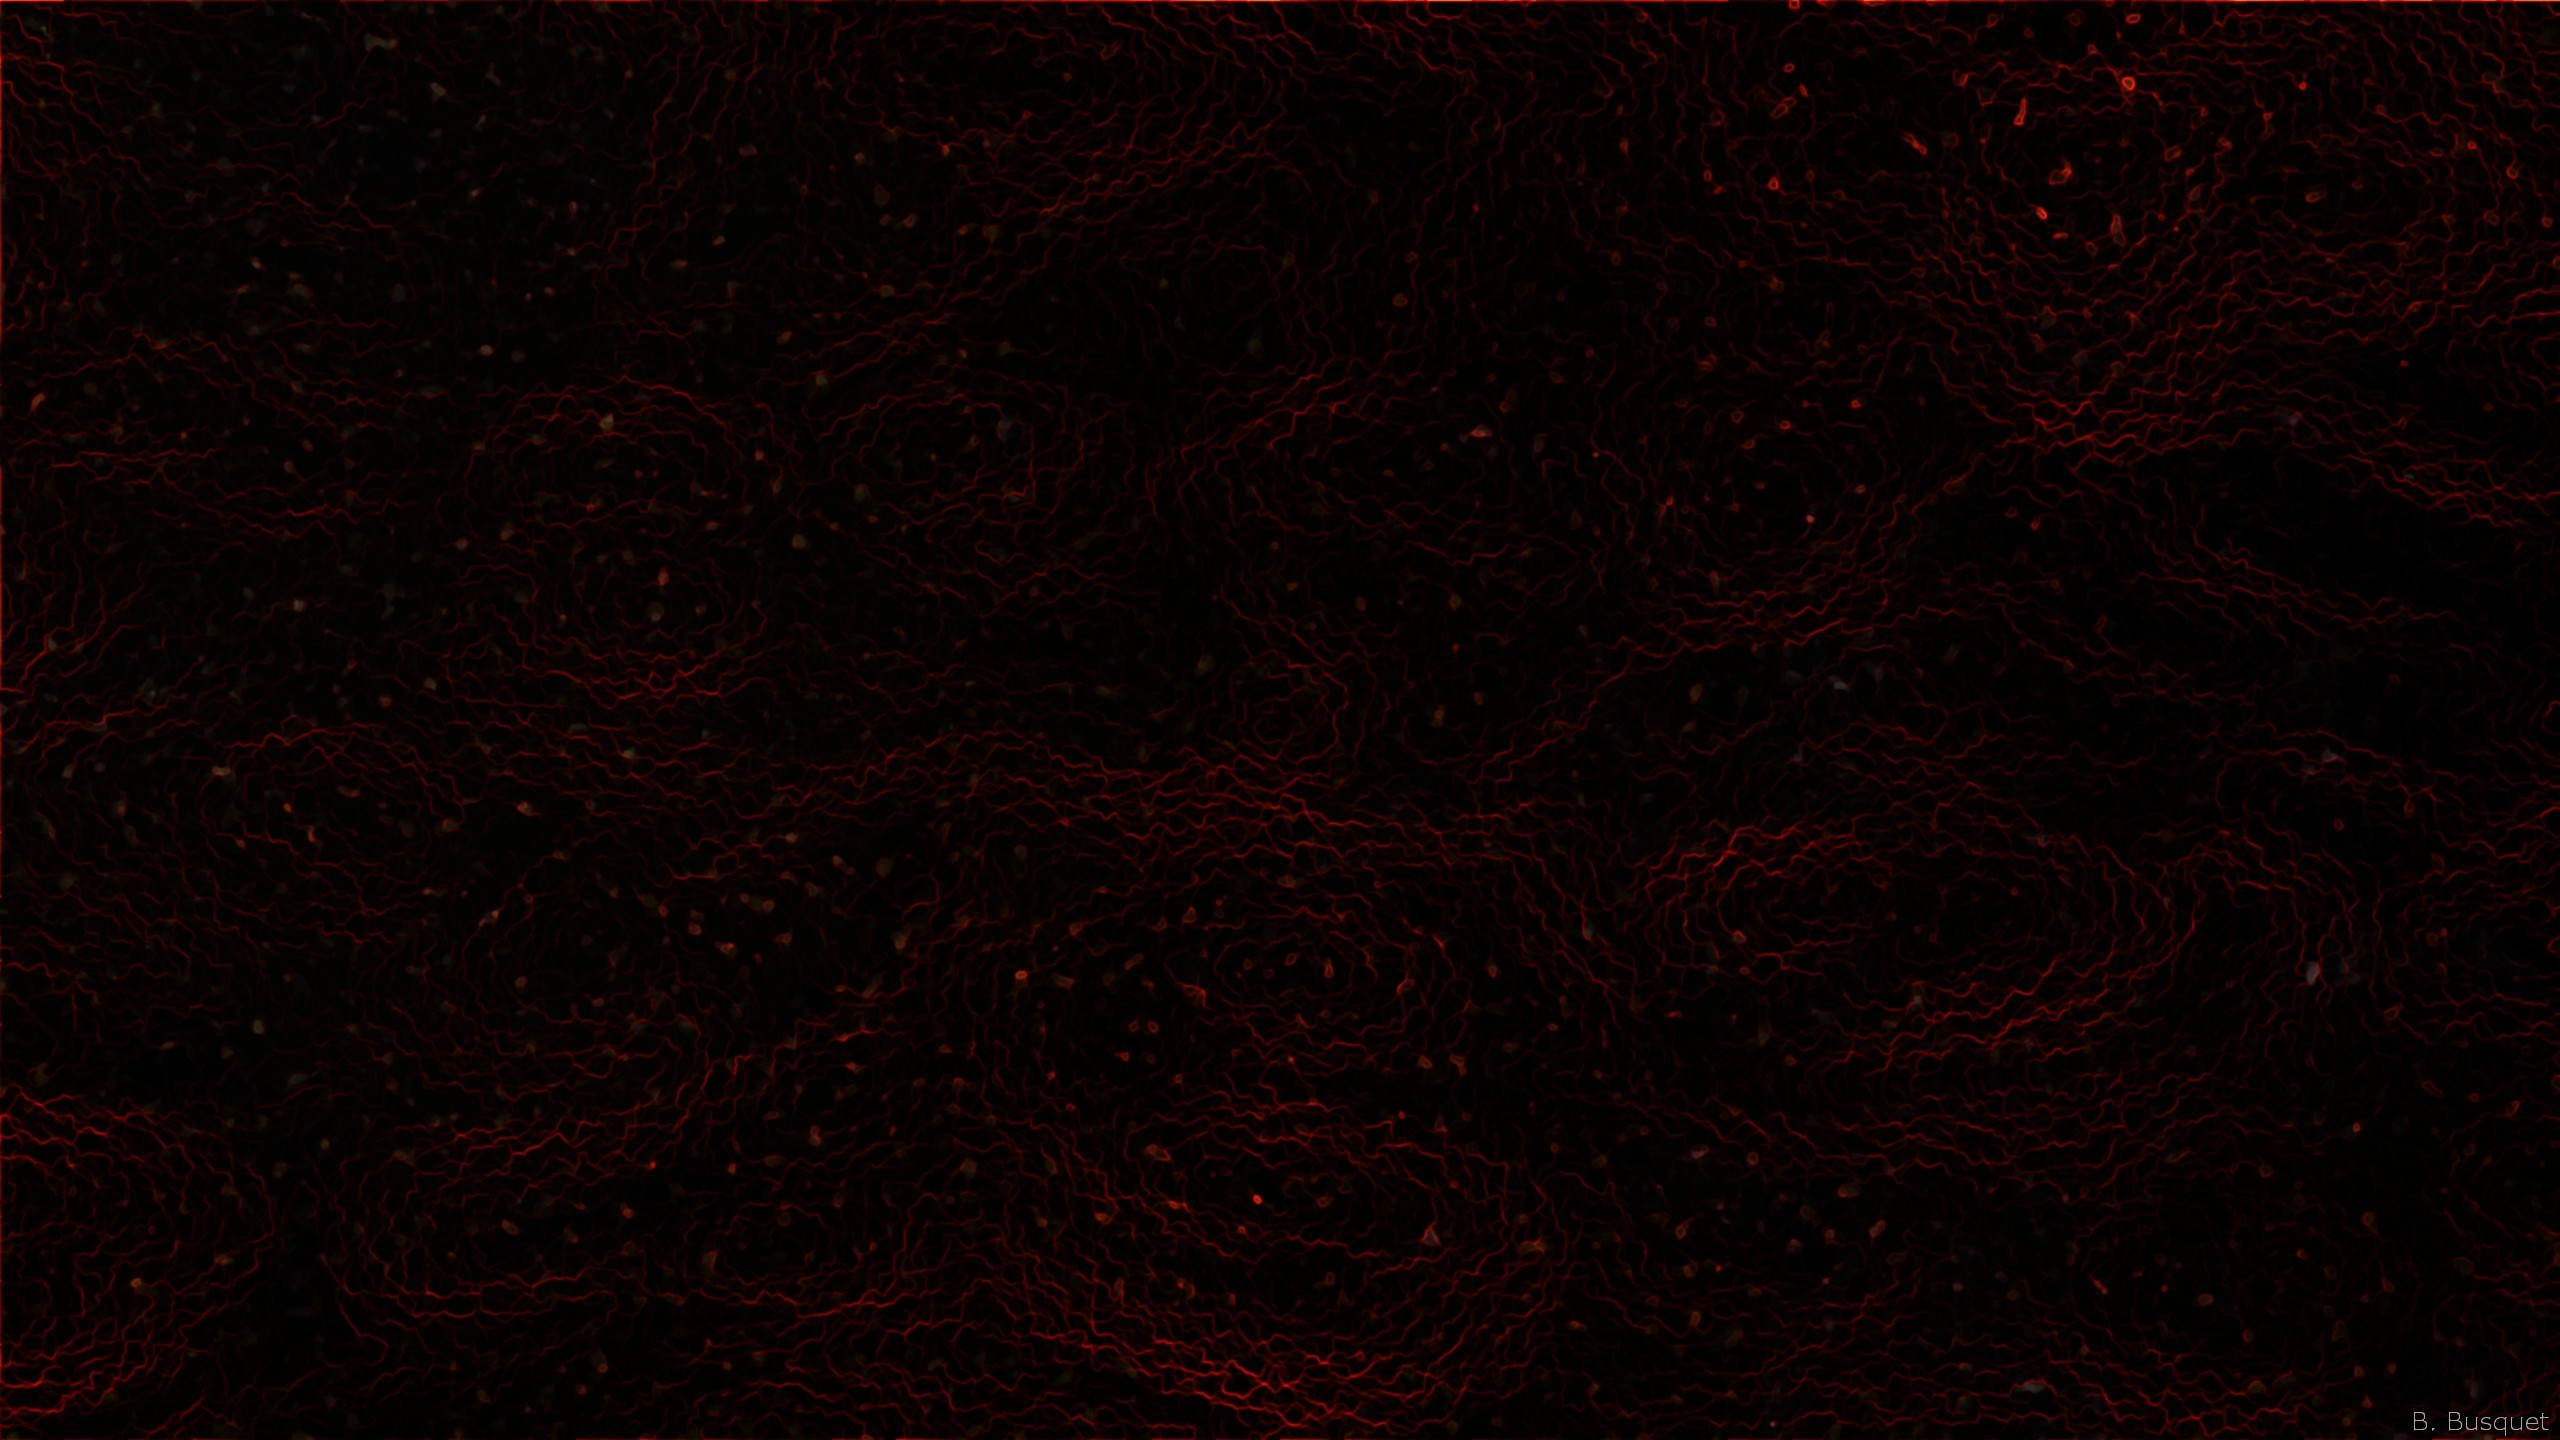 Black And Red Abstract Wallpaper Wallpapertag